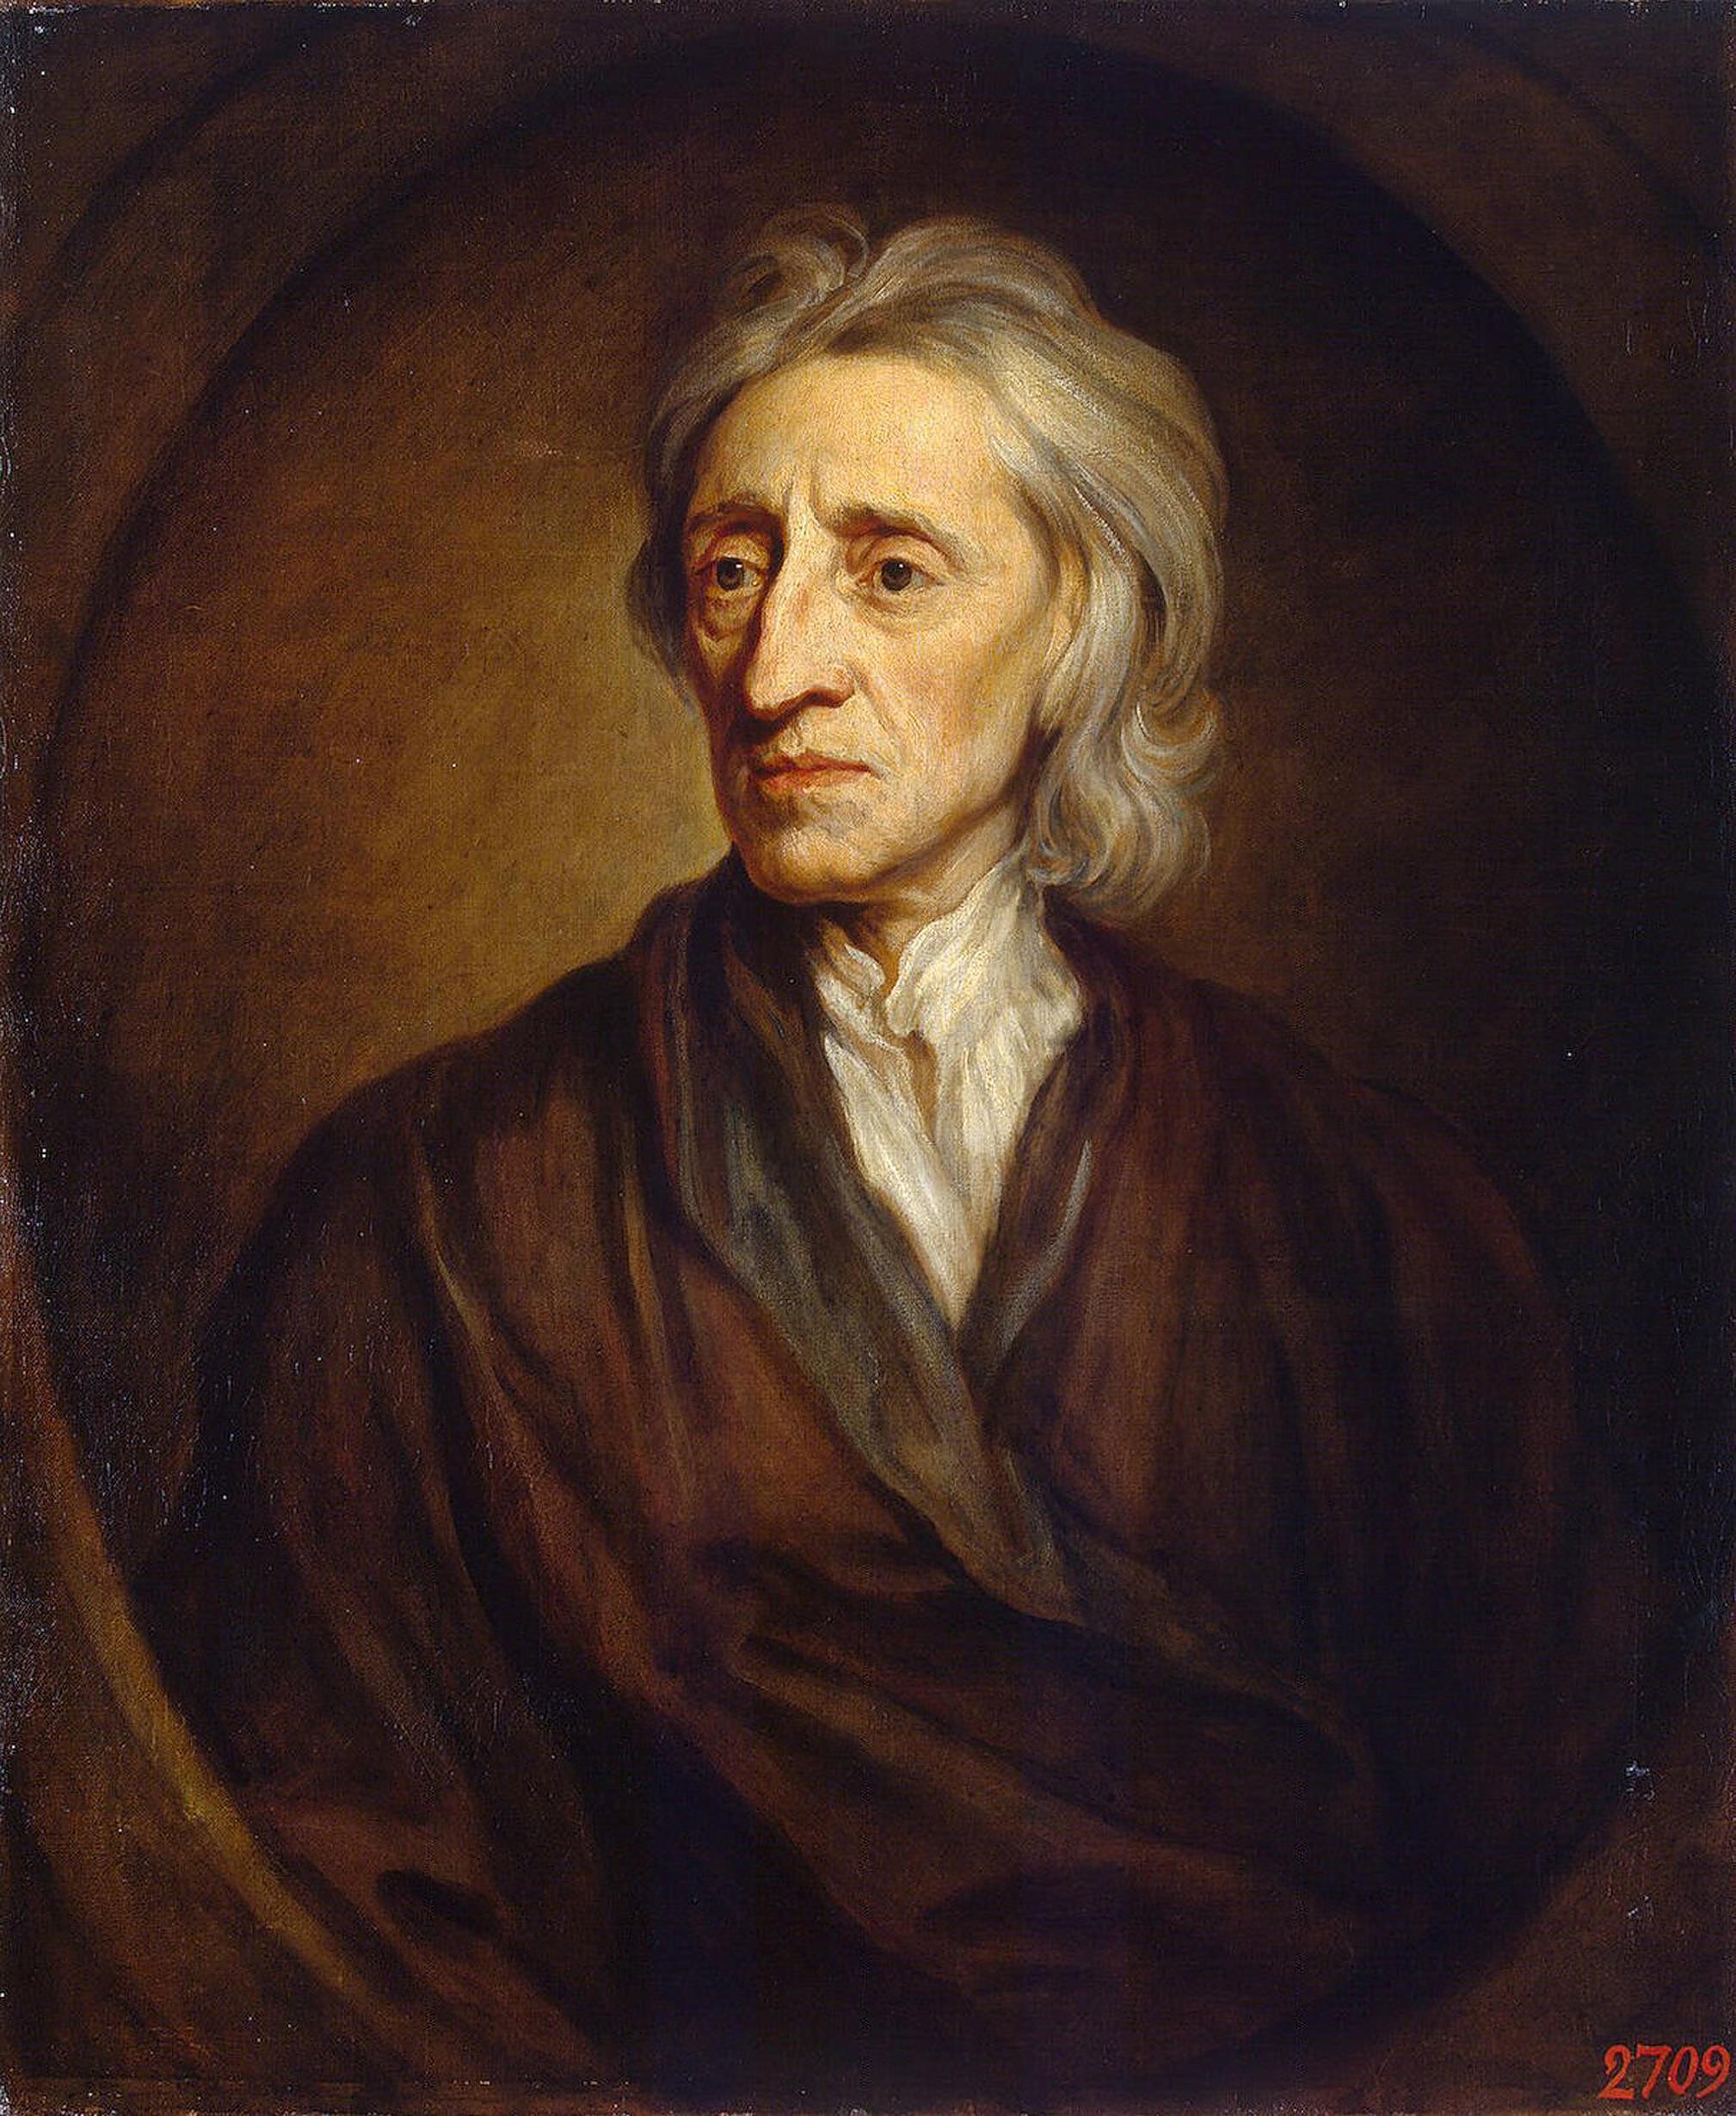 Godfrey_Kneller_-_Portrait_of_John_Locke_(Hermitage).jpg